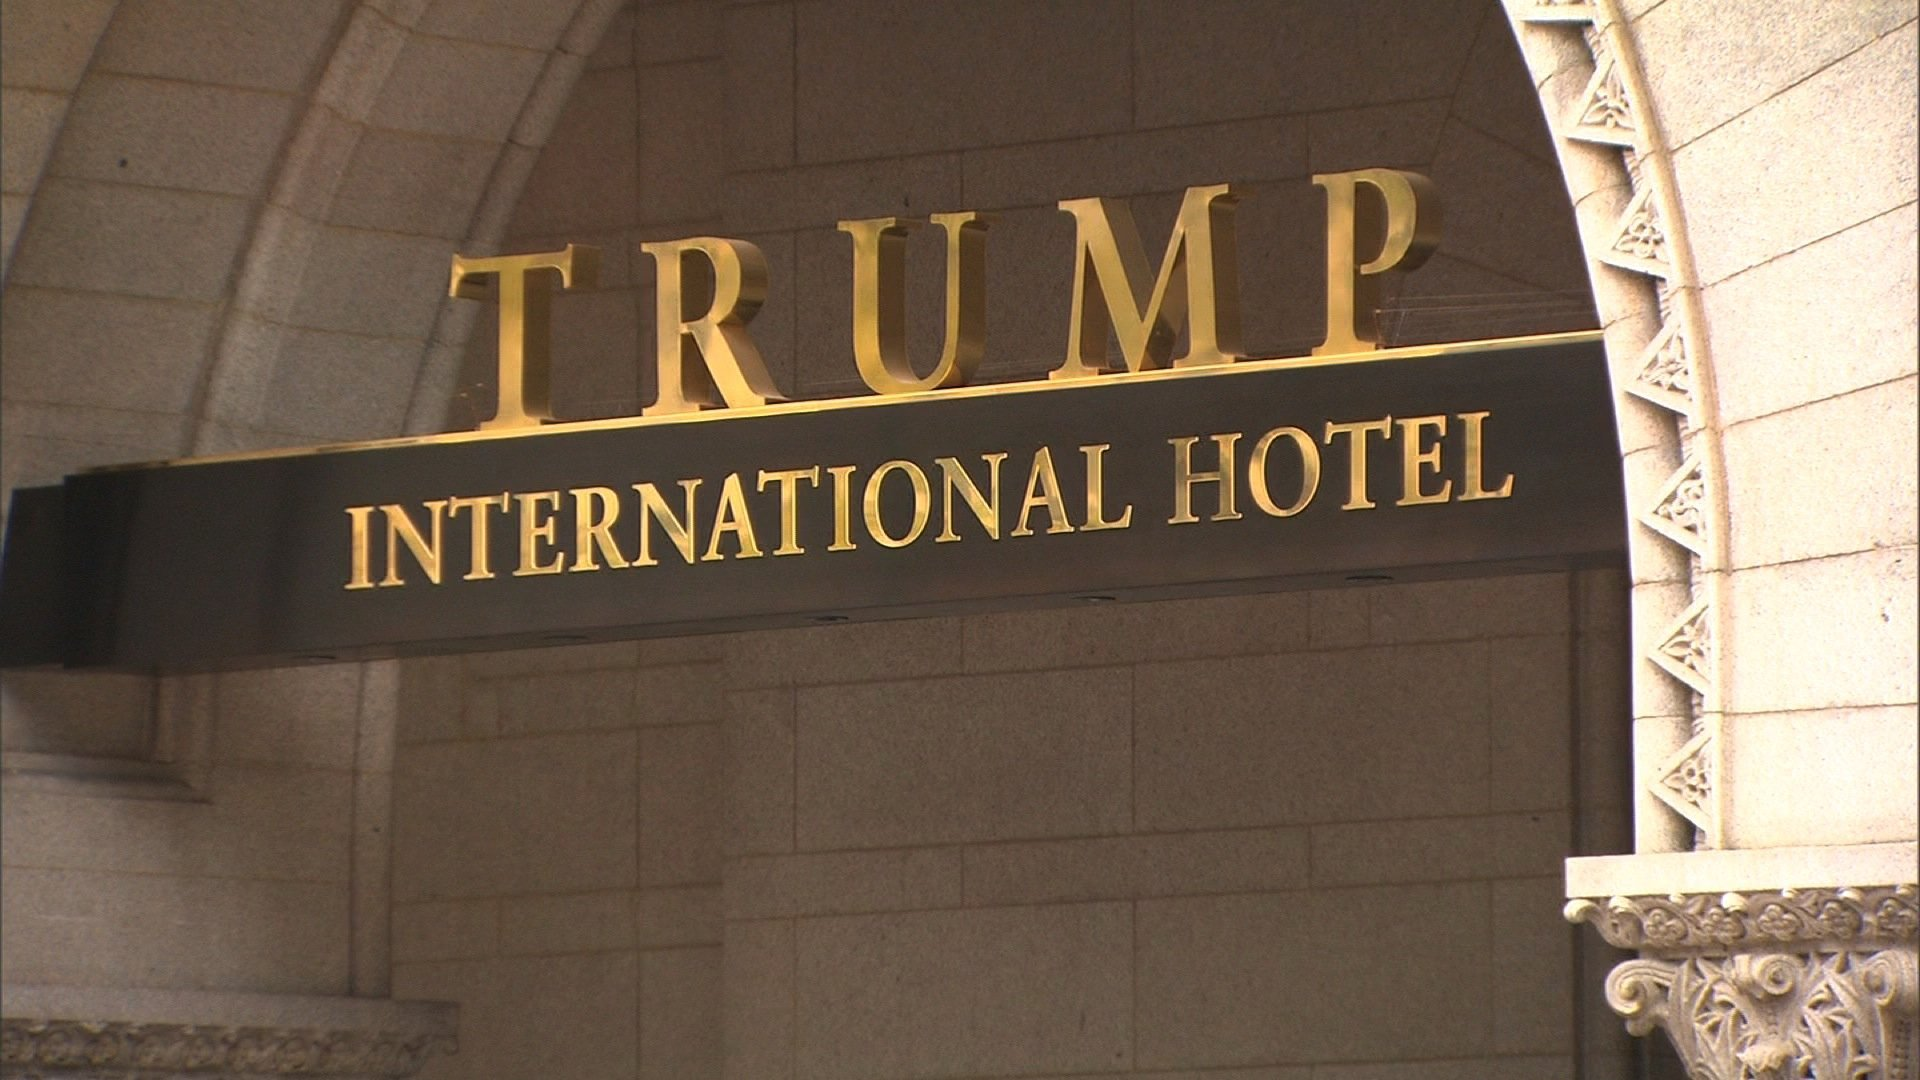 Trump International Hotel in Washington, D.C. is seen in an undated photo. (Credit: CNN)